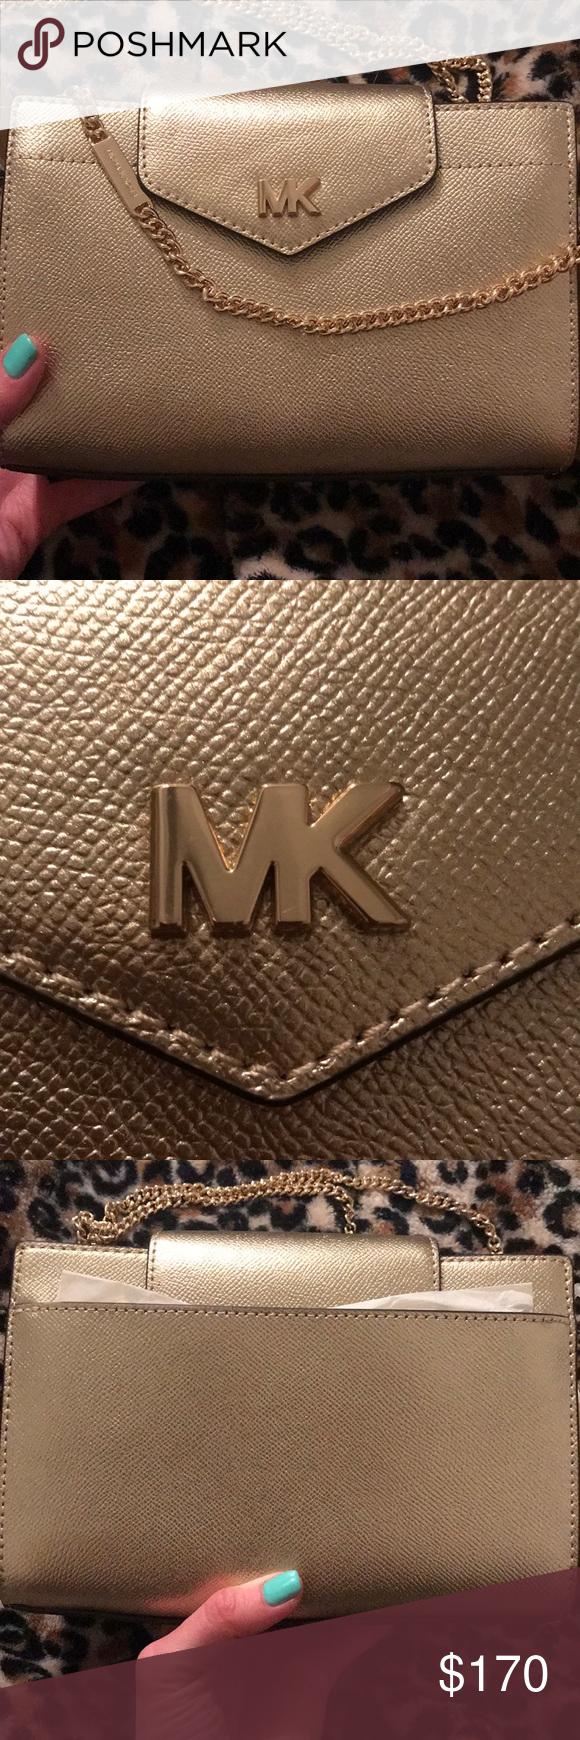 Michael Kors Bag Michael Kors Bag Super cute Micha